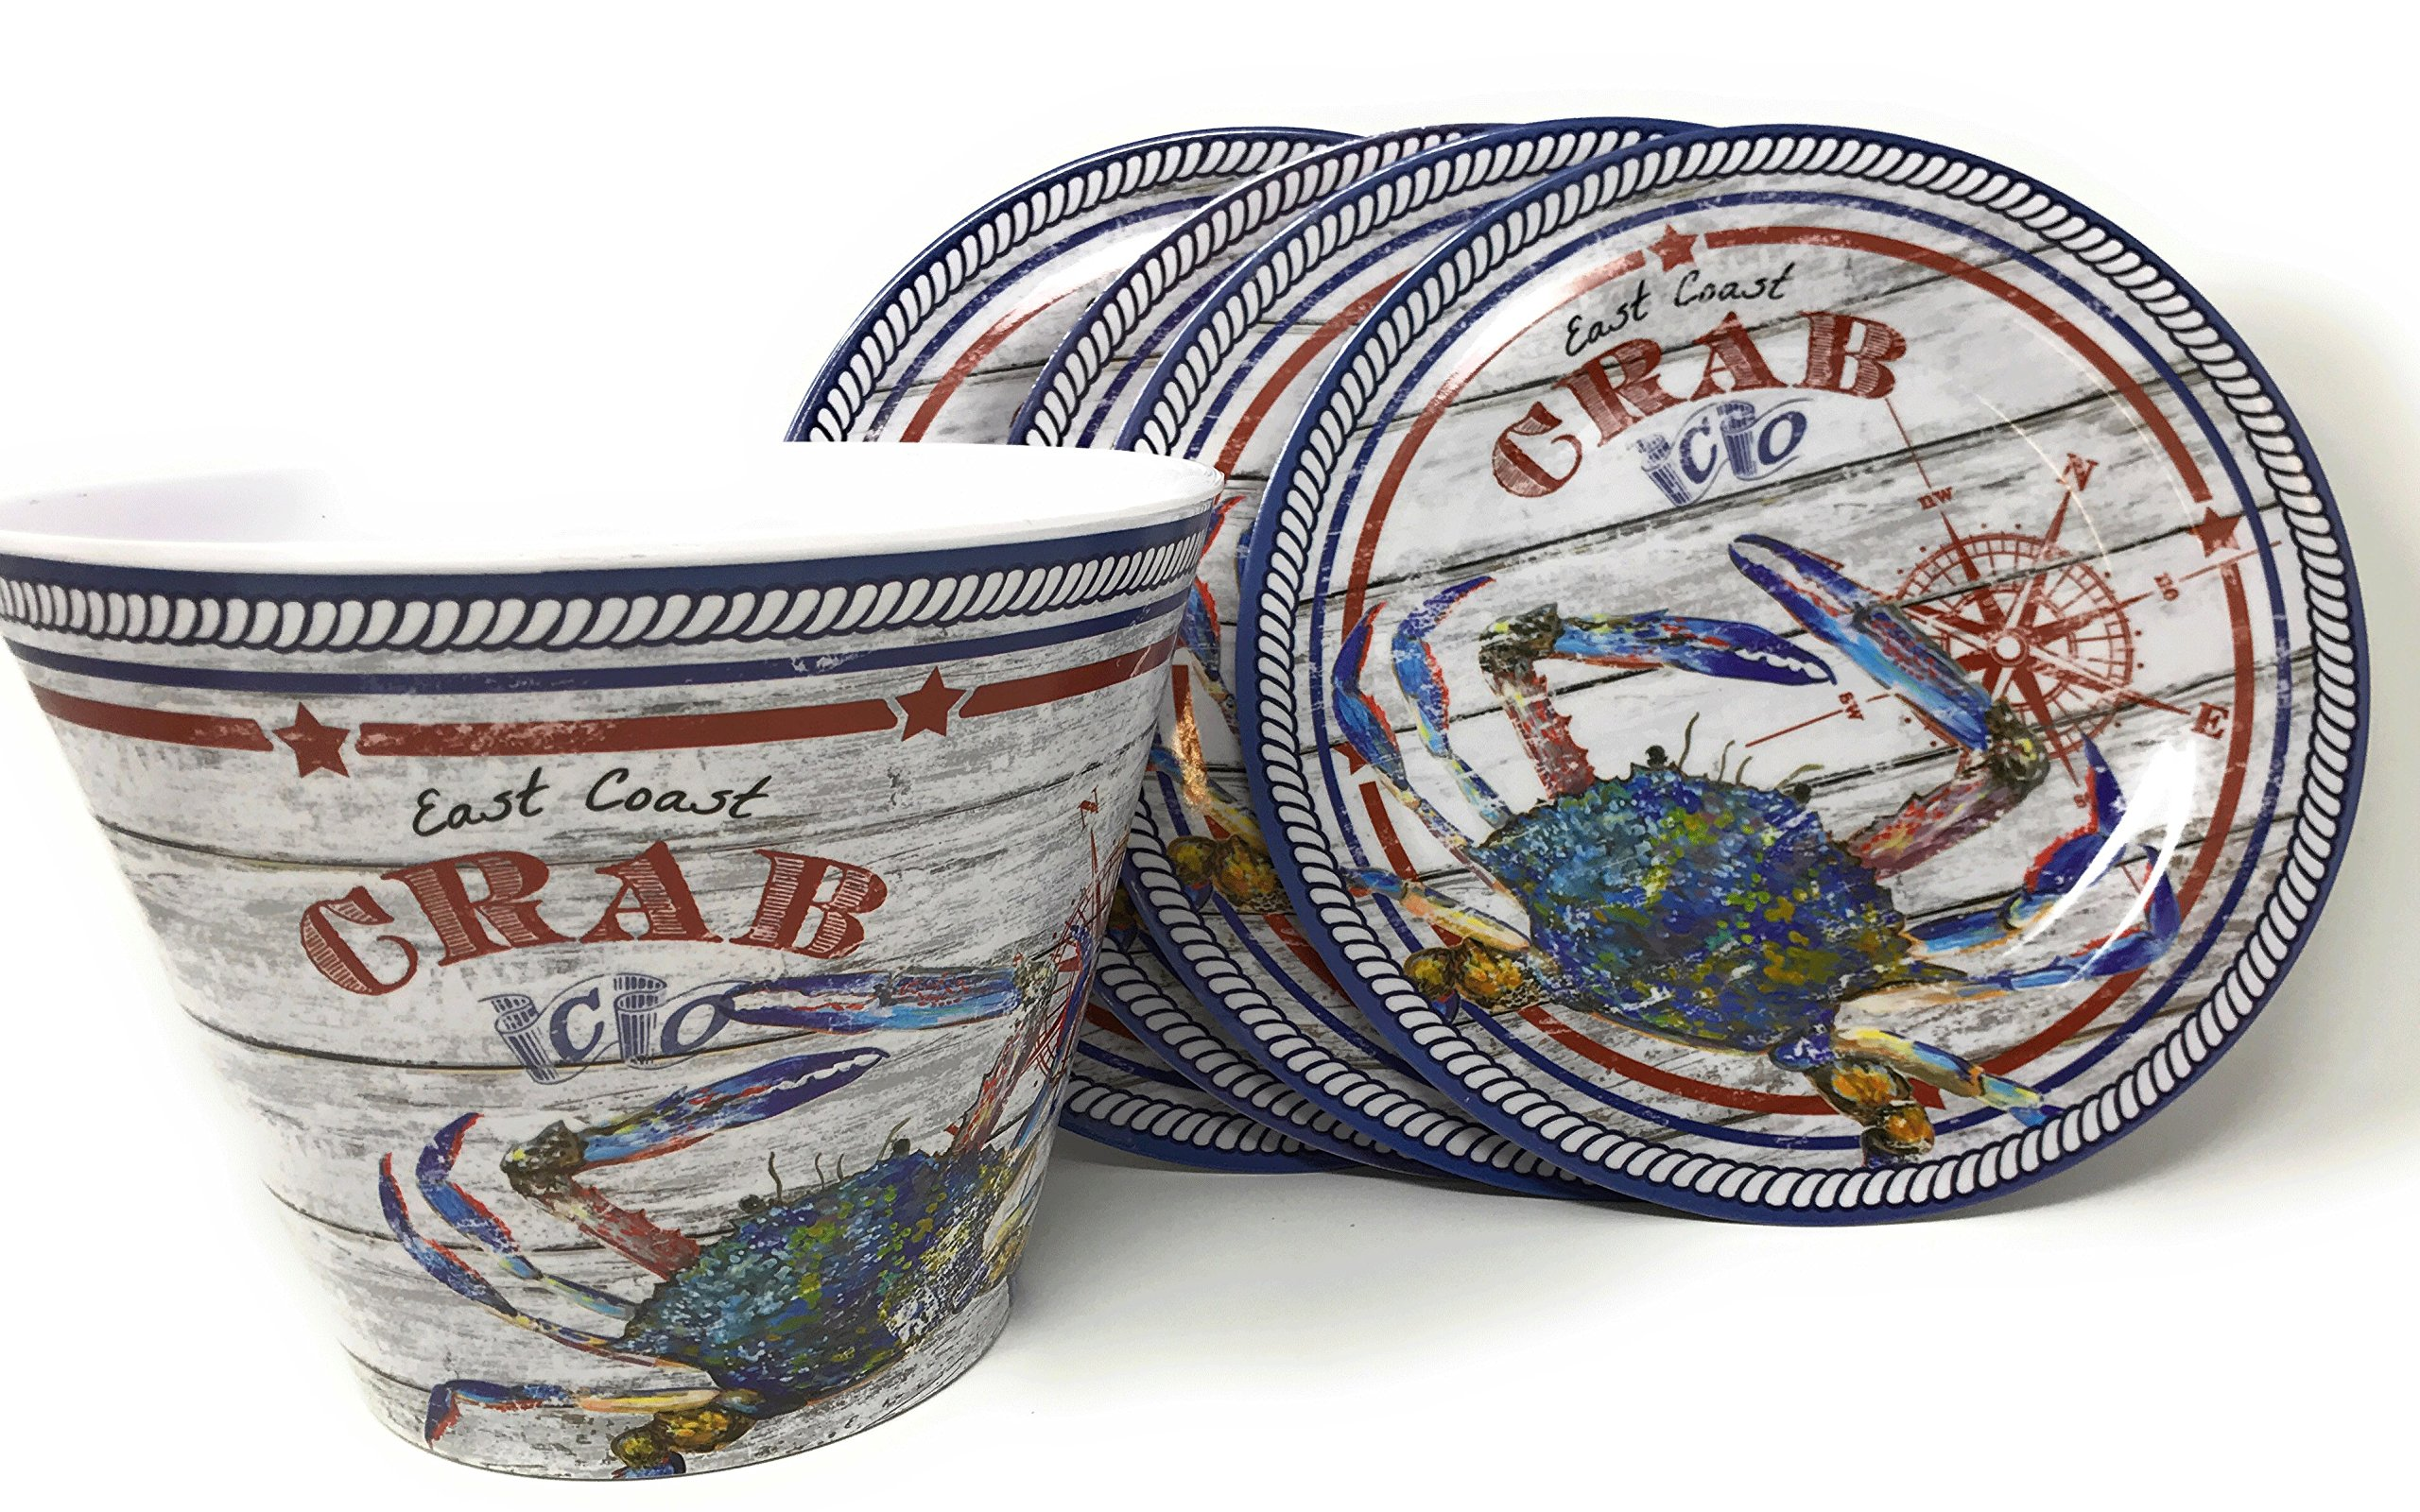 Northeast Home East Coast Crab Melamine Dinner Plates and Bucket, 5-Piece Set